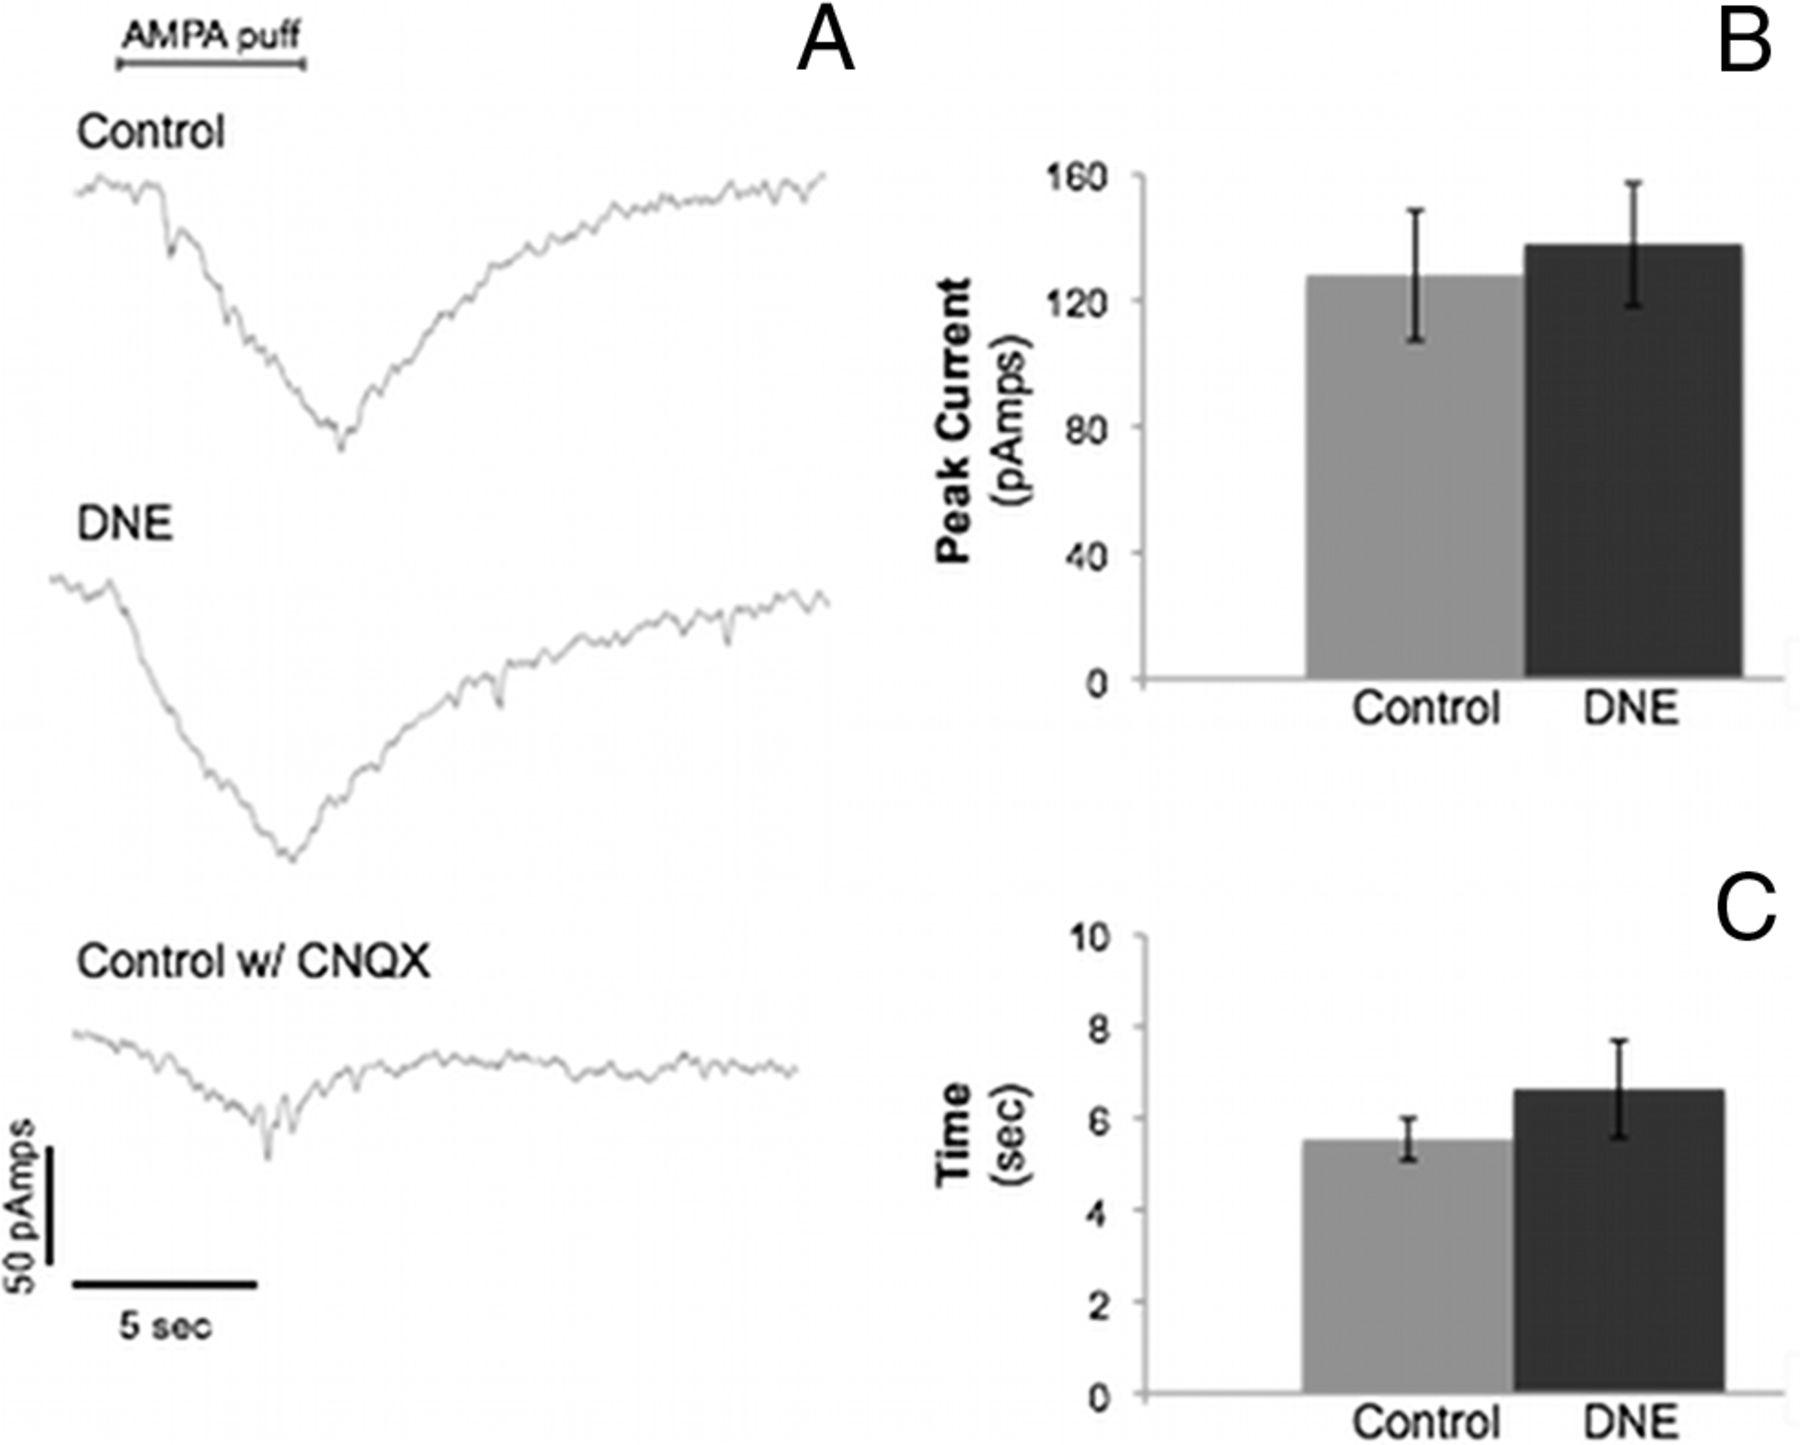 Developmental Nicotine Exposure Alters AMPA Neurotransmission in the